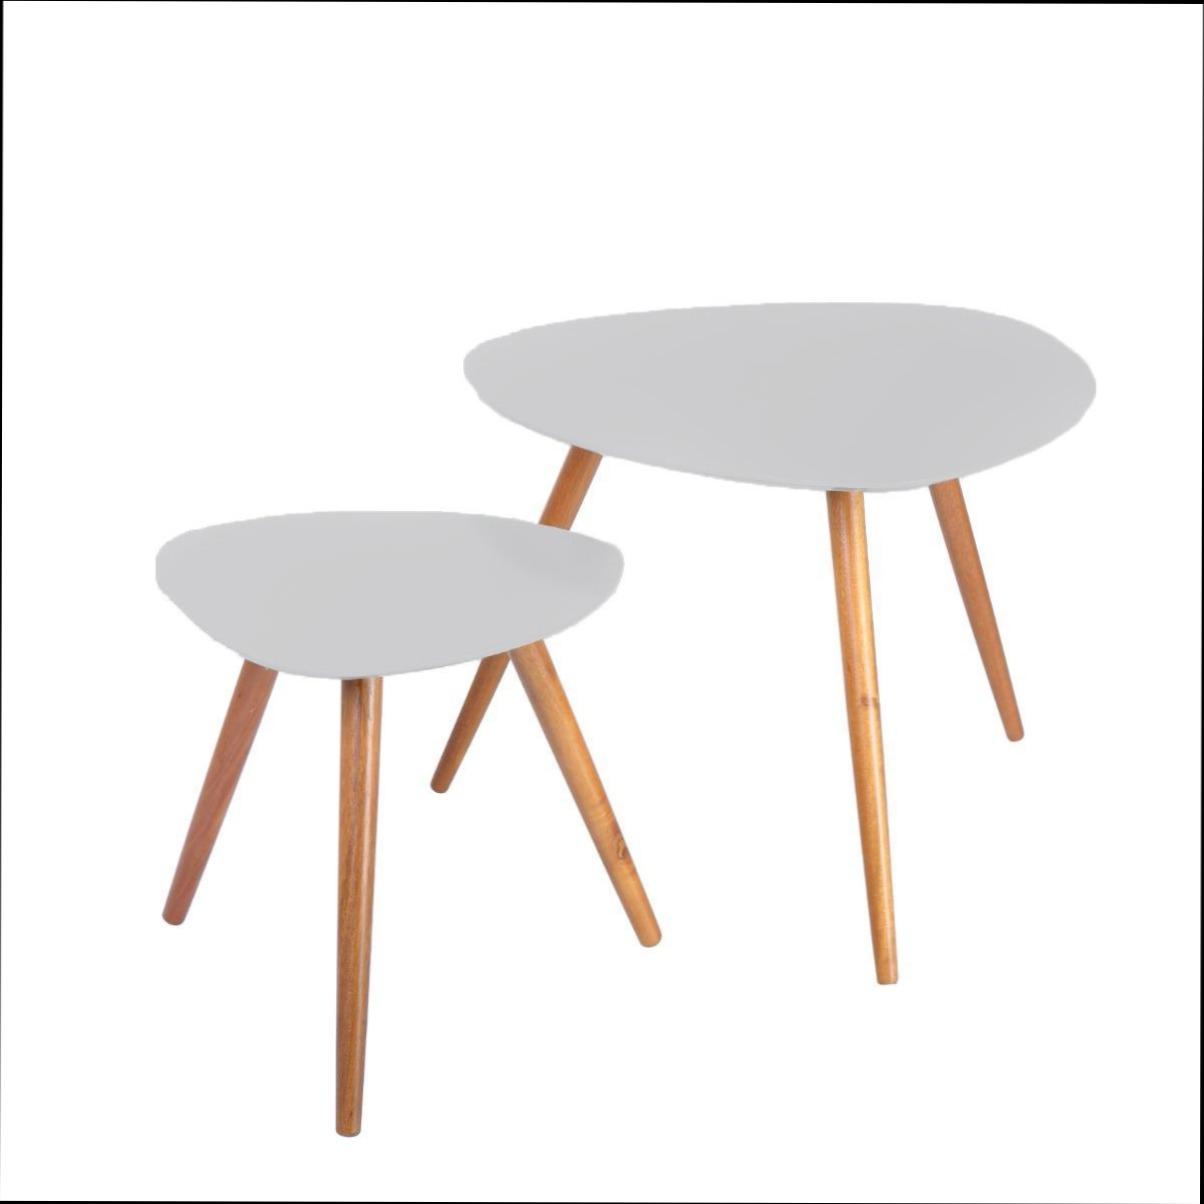 Table Basse Amazon Inspirant Galerie Emejing Table Basse Amazone Joshkrajcik Joshkrajcik